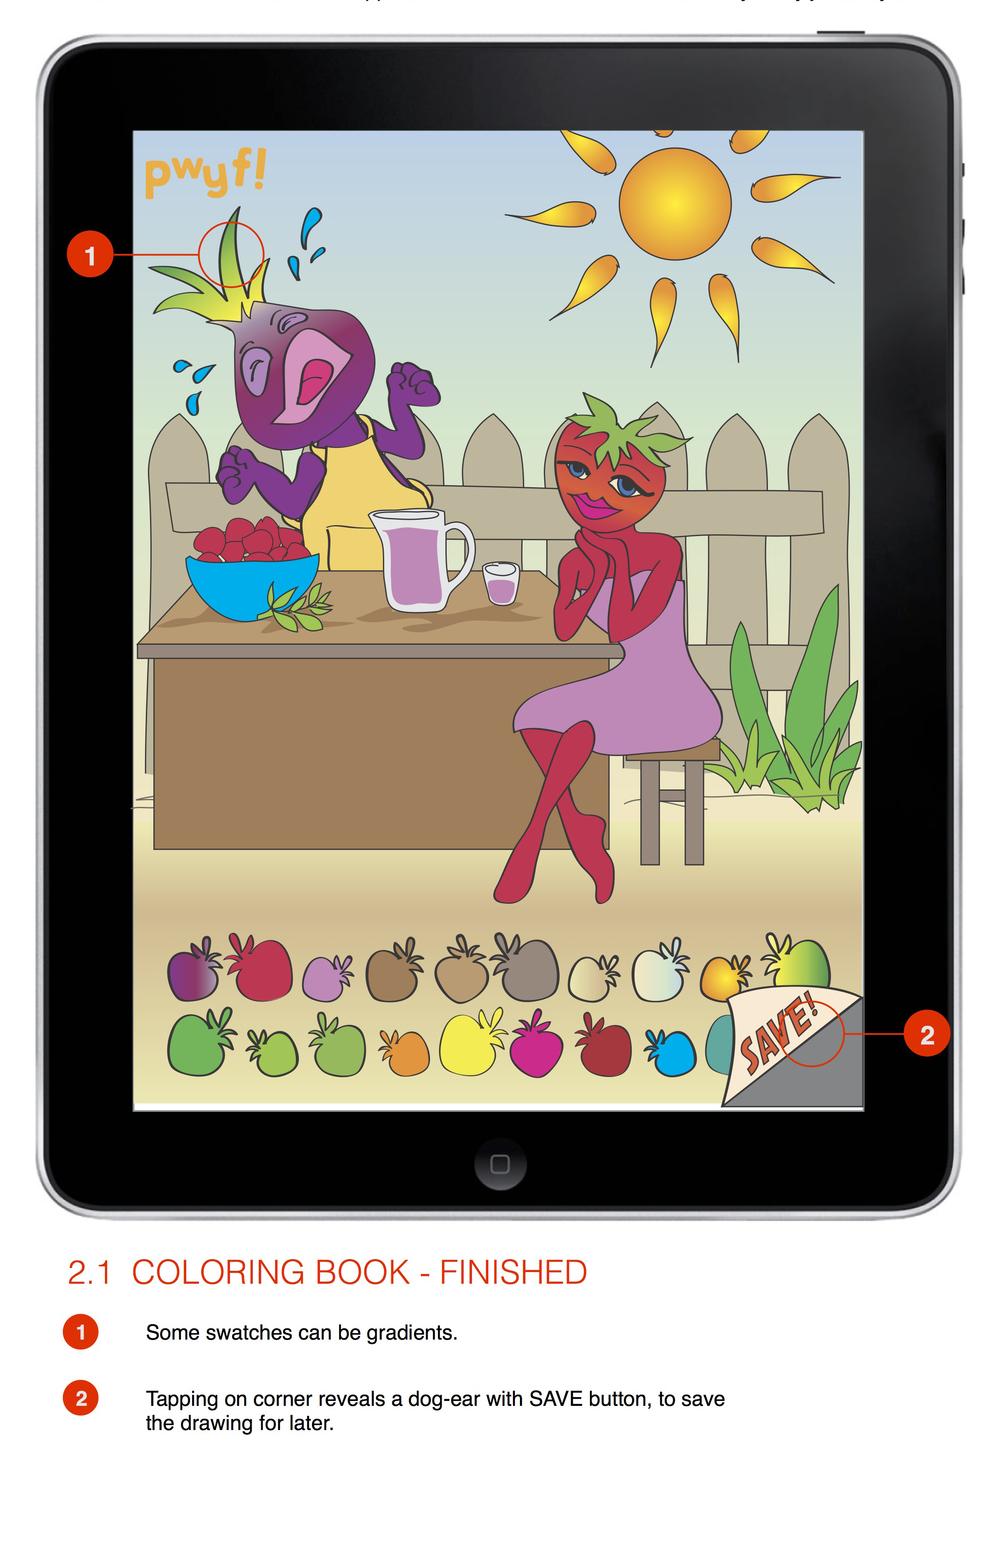 PWYF!_iPadApp_wireframes_large.6.jpg